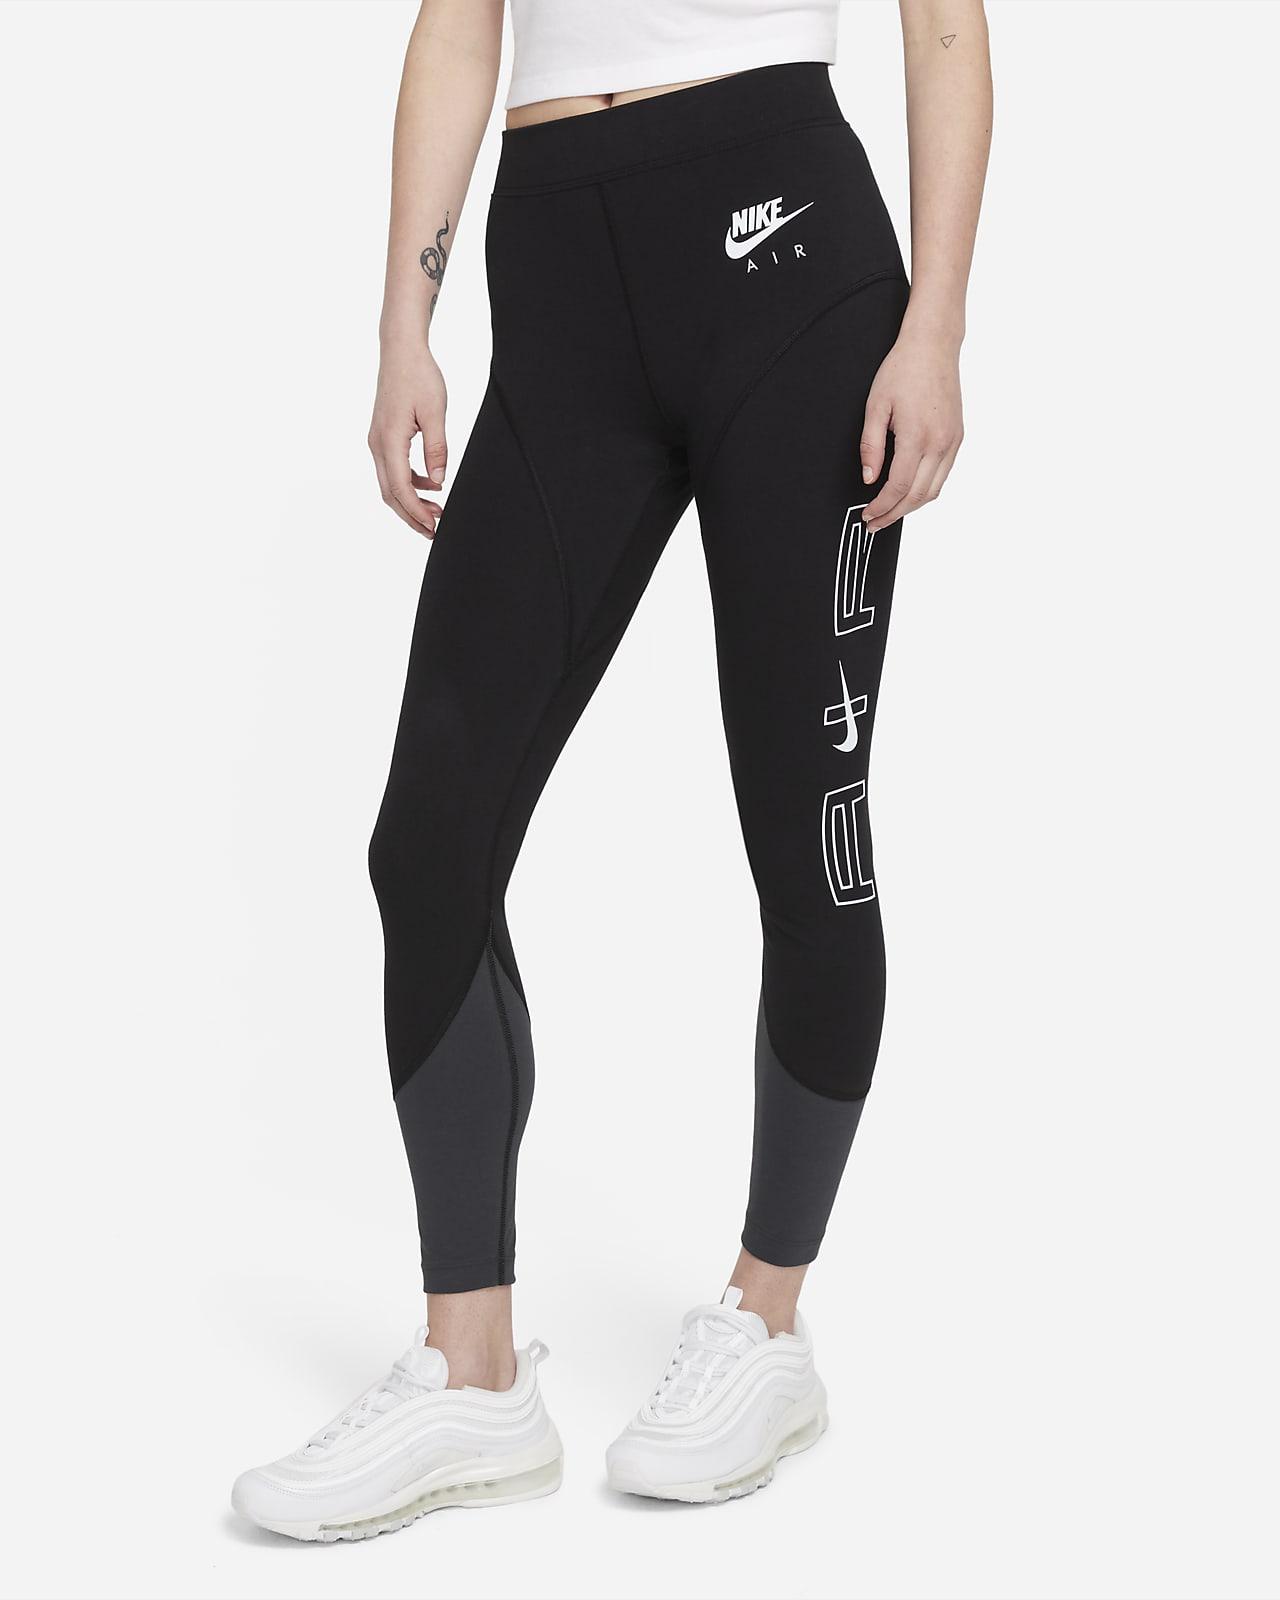 Nike Air Leggings de talle alto - Mujer